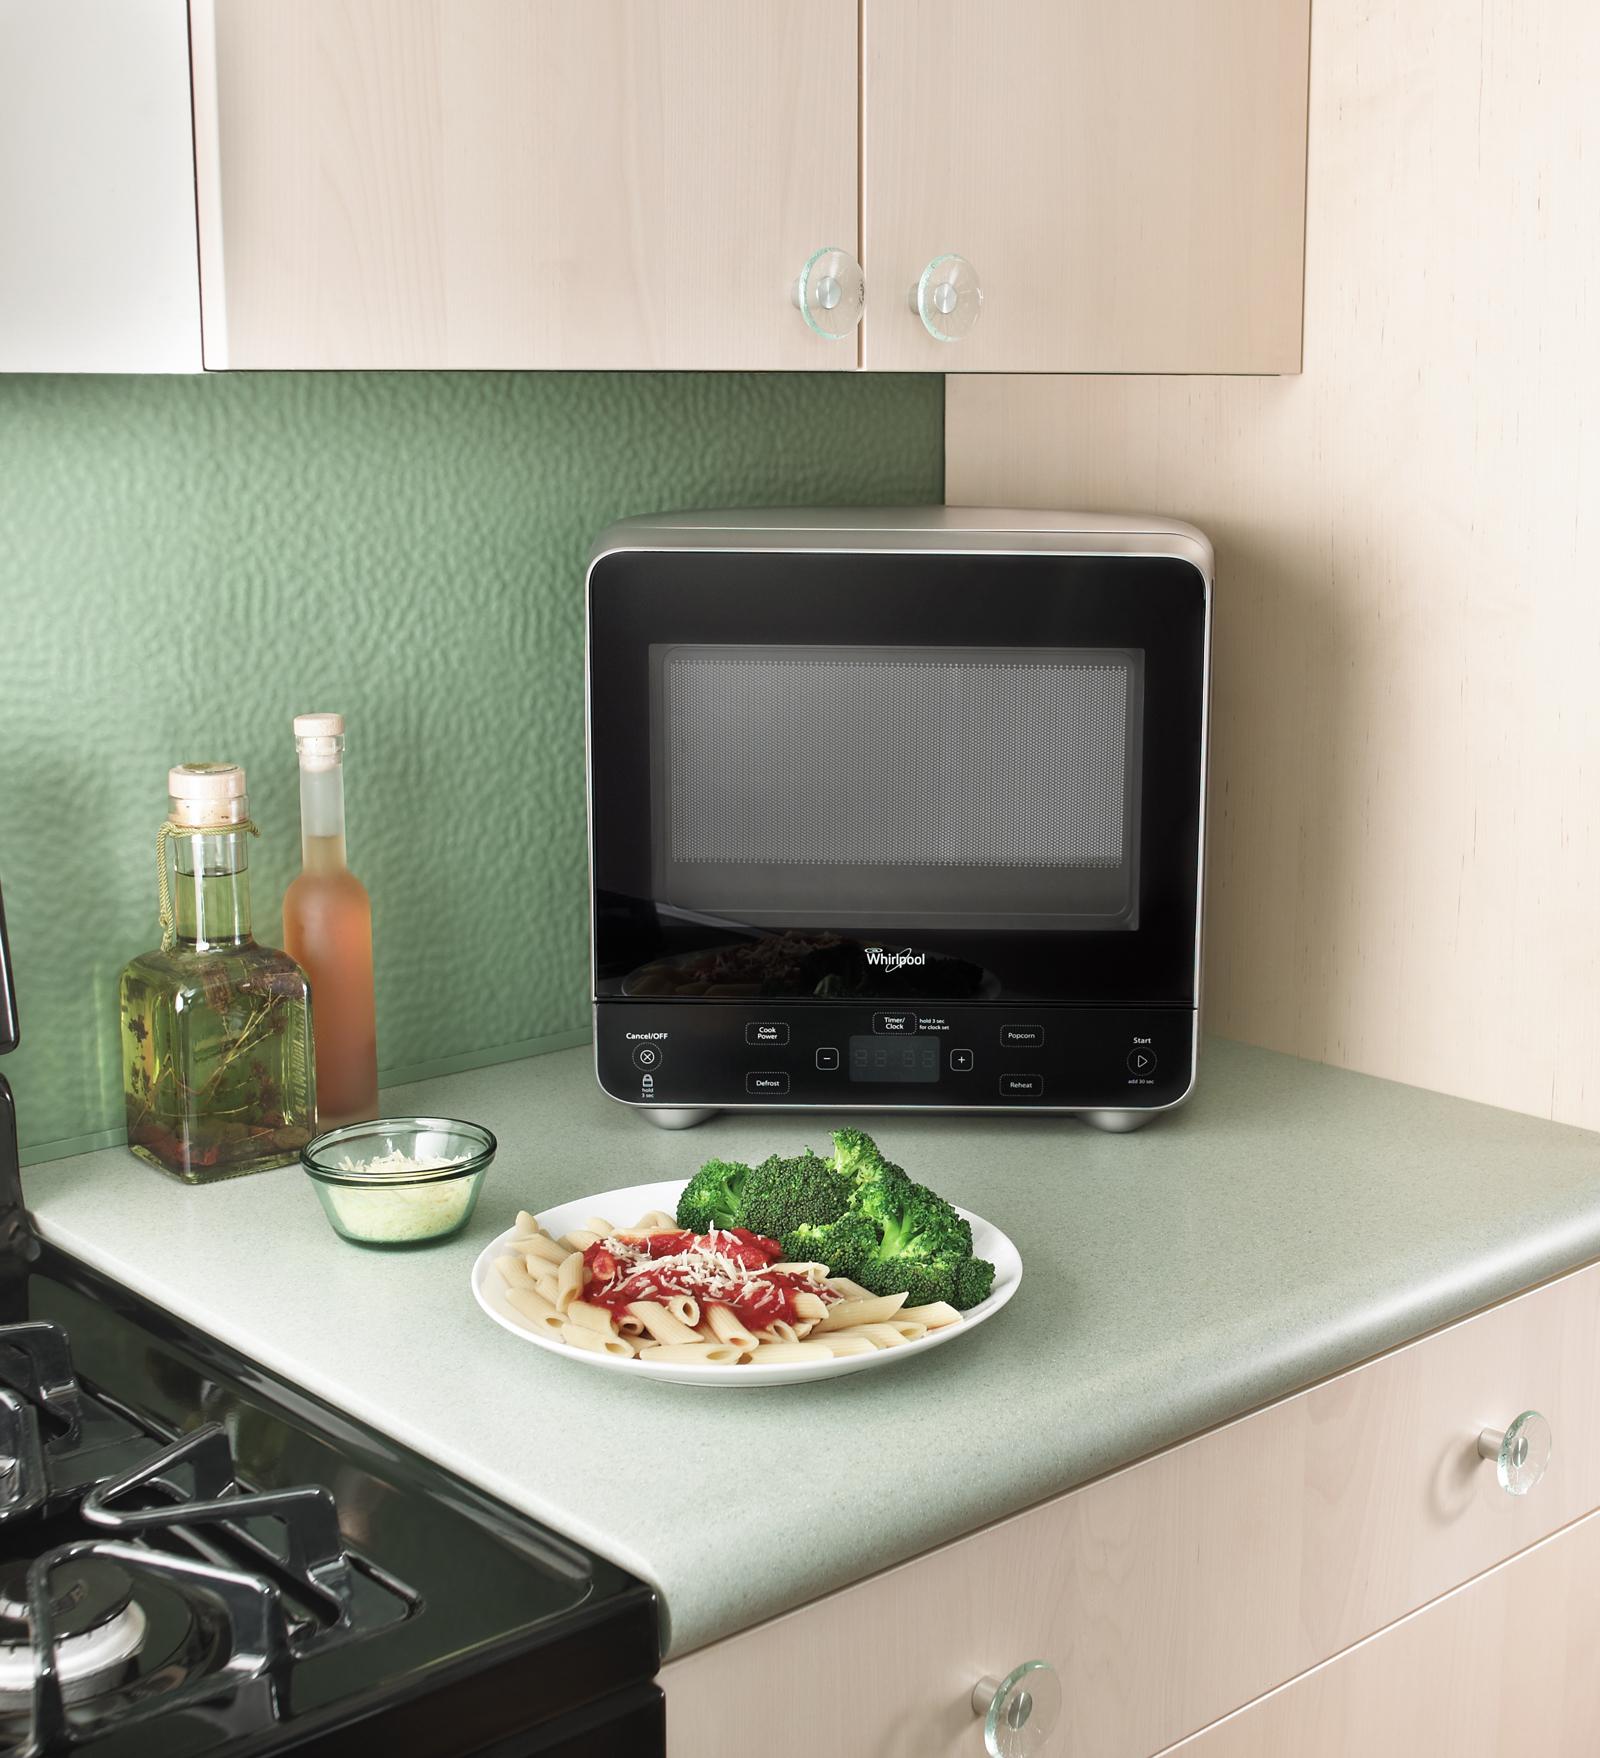 Whirlpool WMC20005YD 0.5 cu. ft. Compact Countertop Microwave w/ Pocket Handle - Silver WMC20005YD